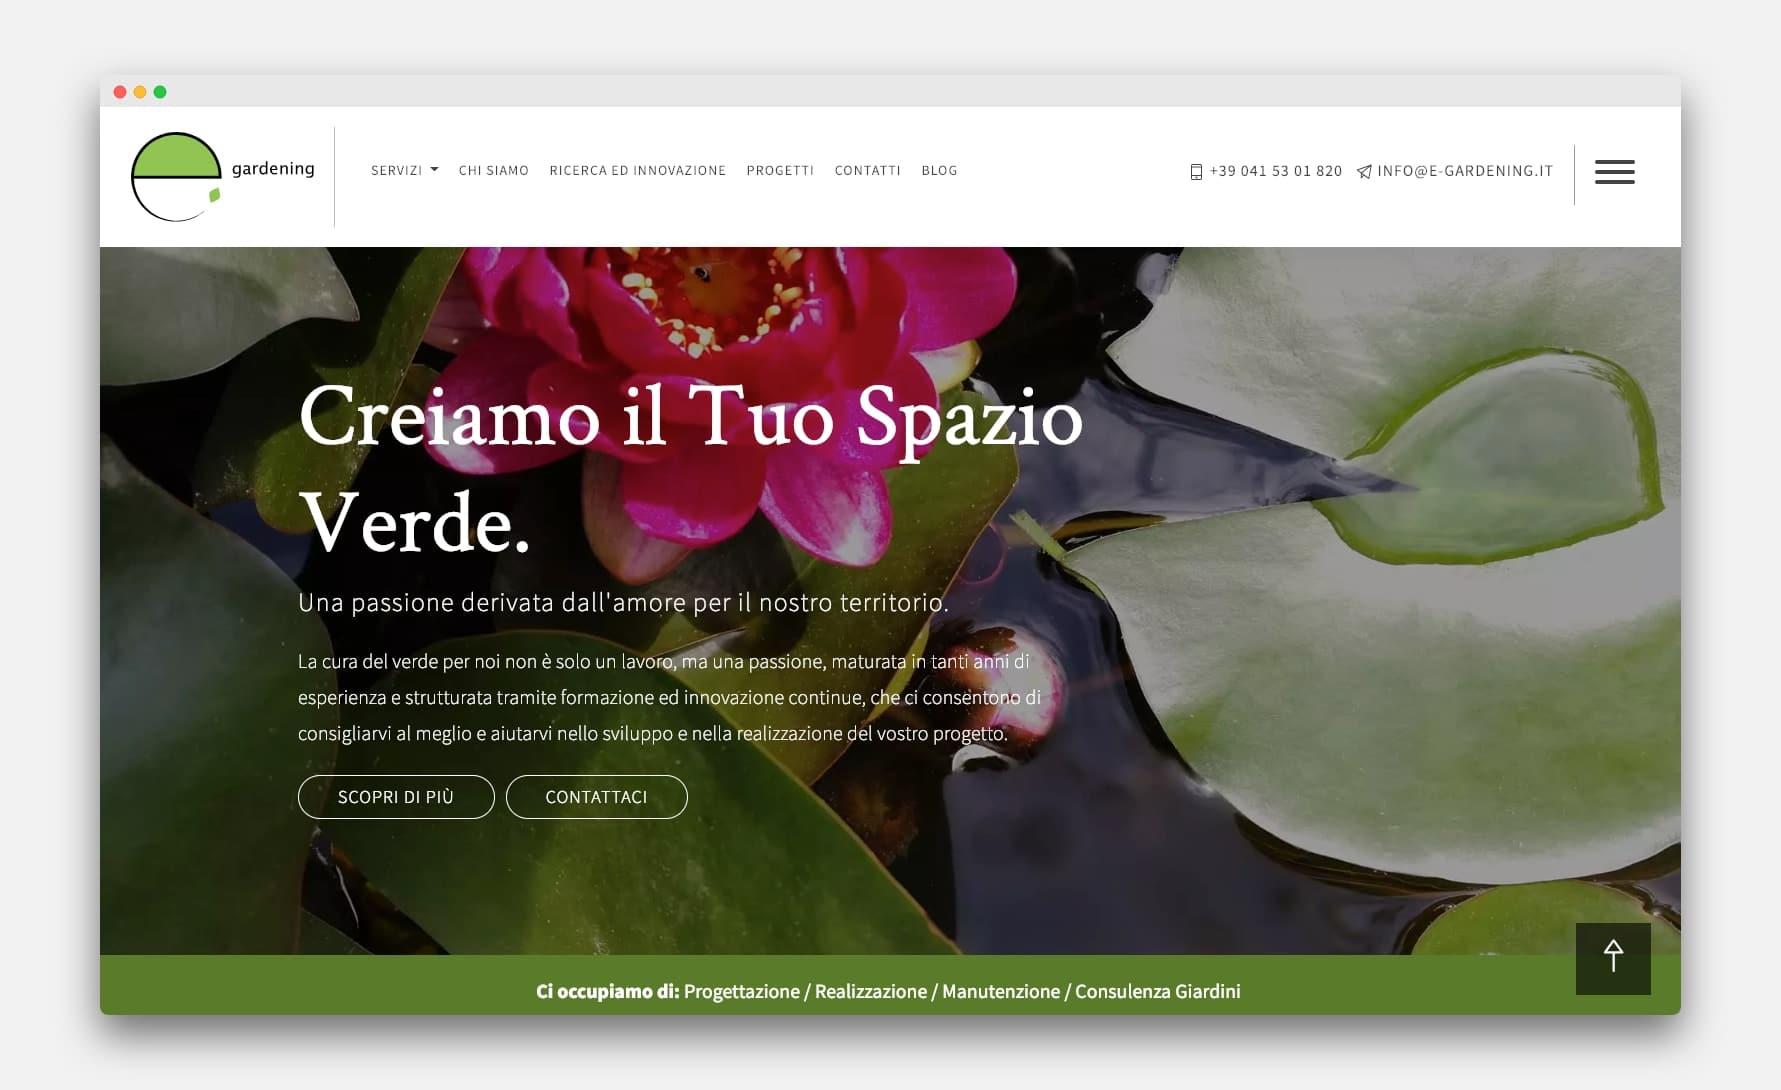 teroro agency e gardening project mockup 1 - E-Gardening